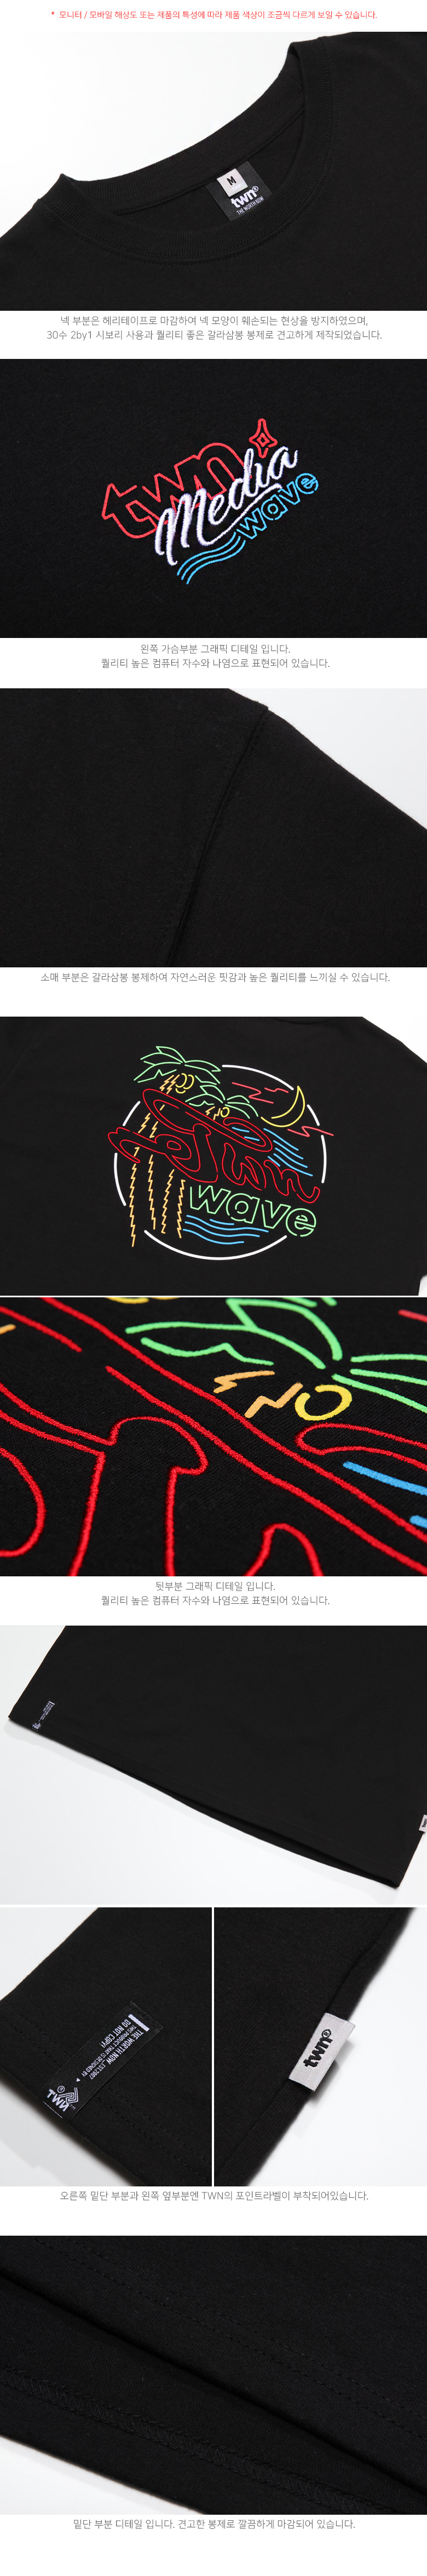 20190304_twn_neonwave_detail_bk_je_02.jpg